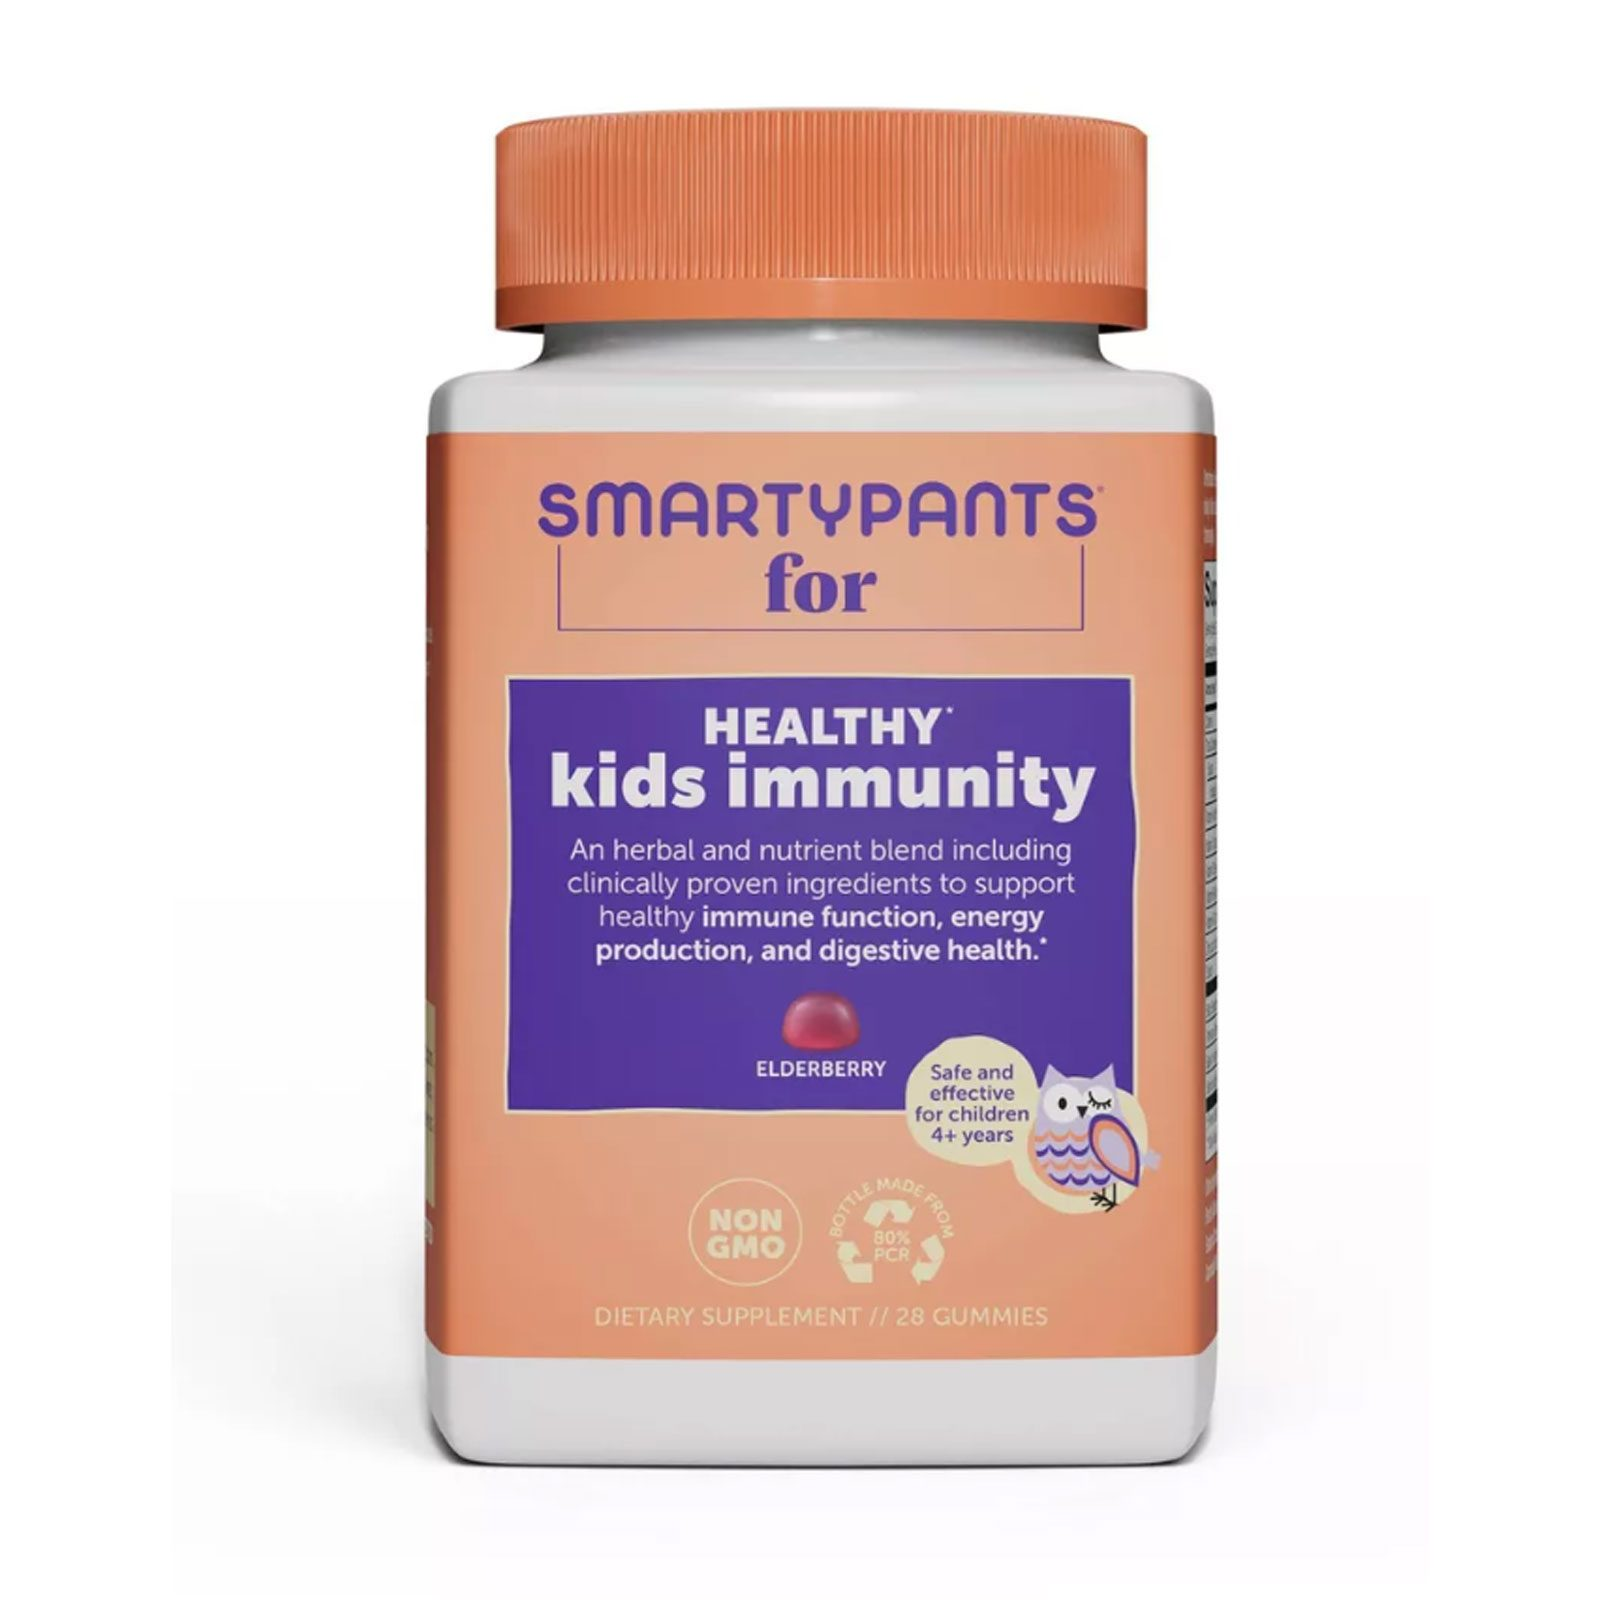 SmartyPants Healthy Kids Immunity